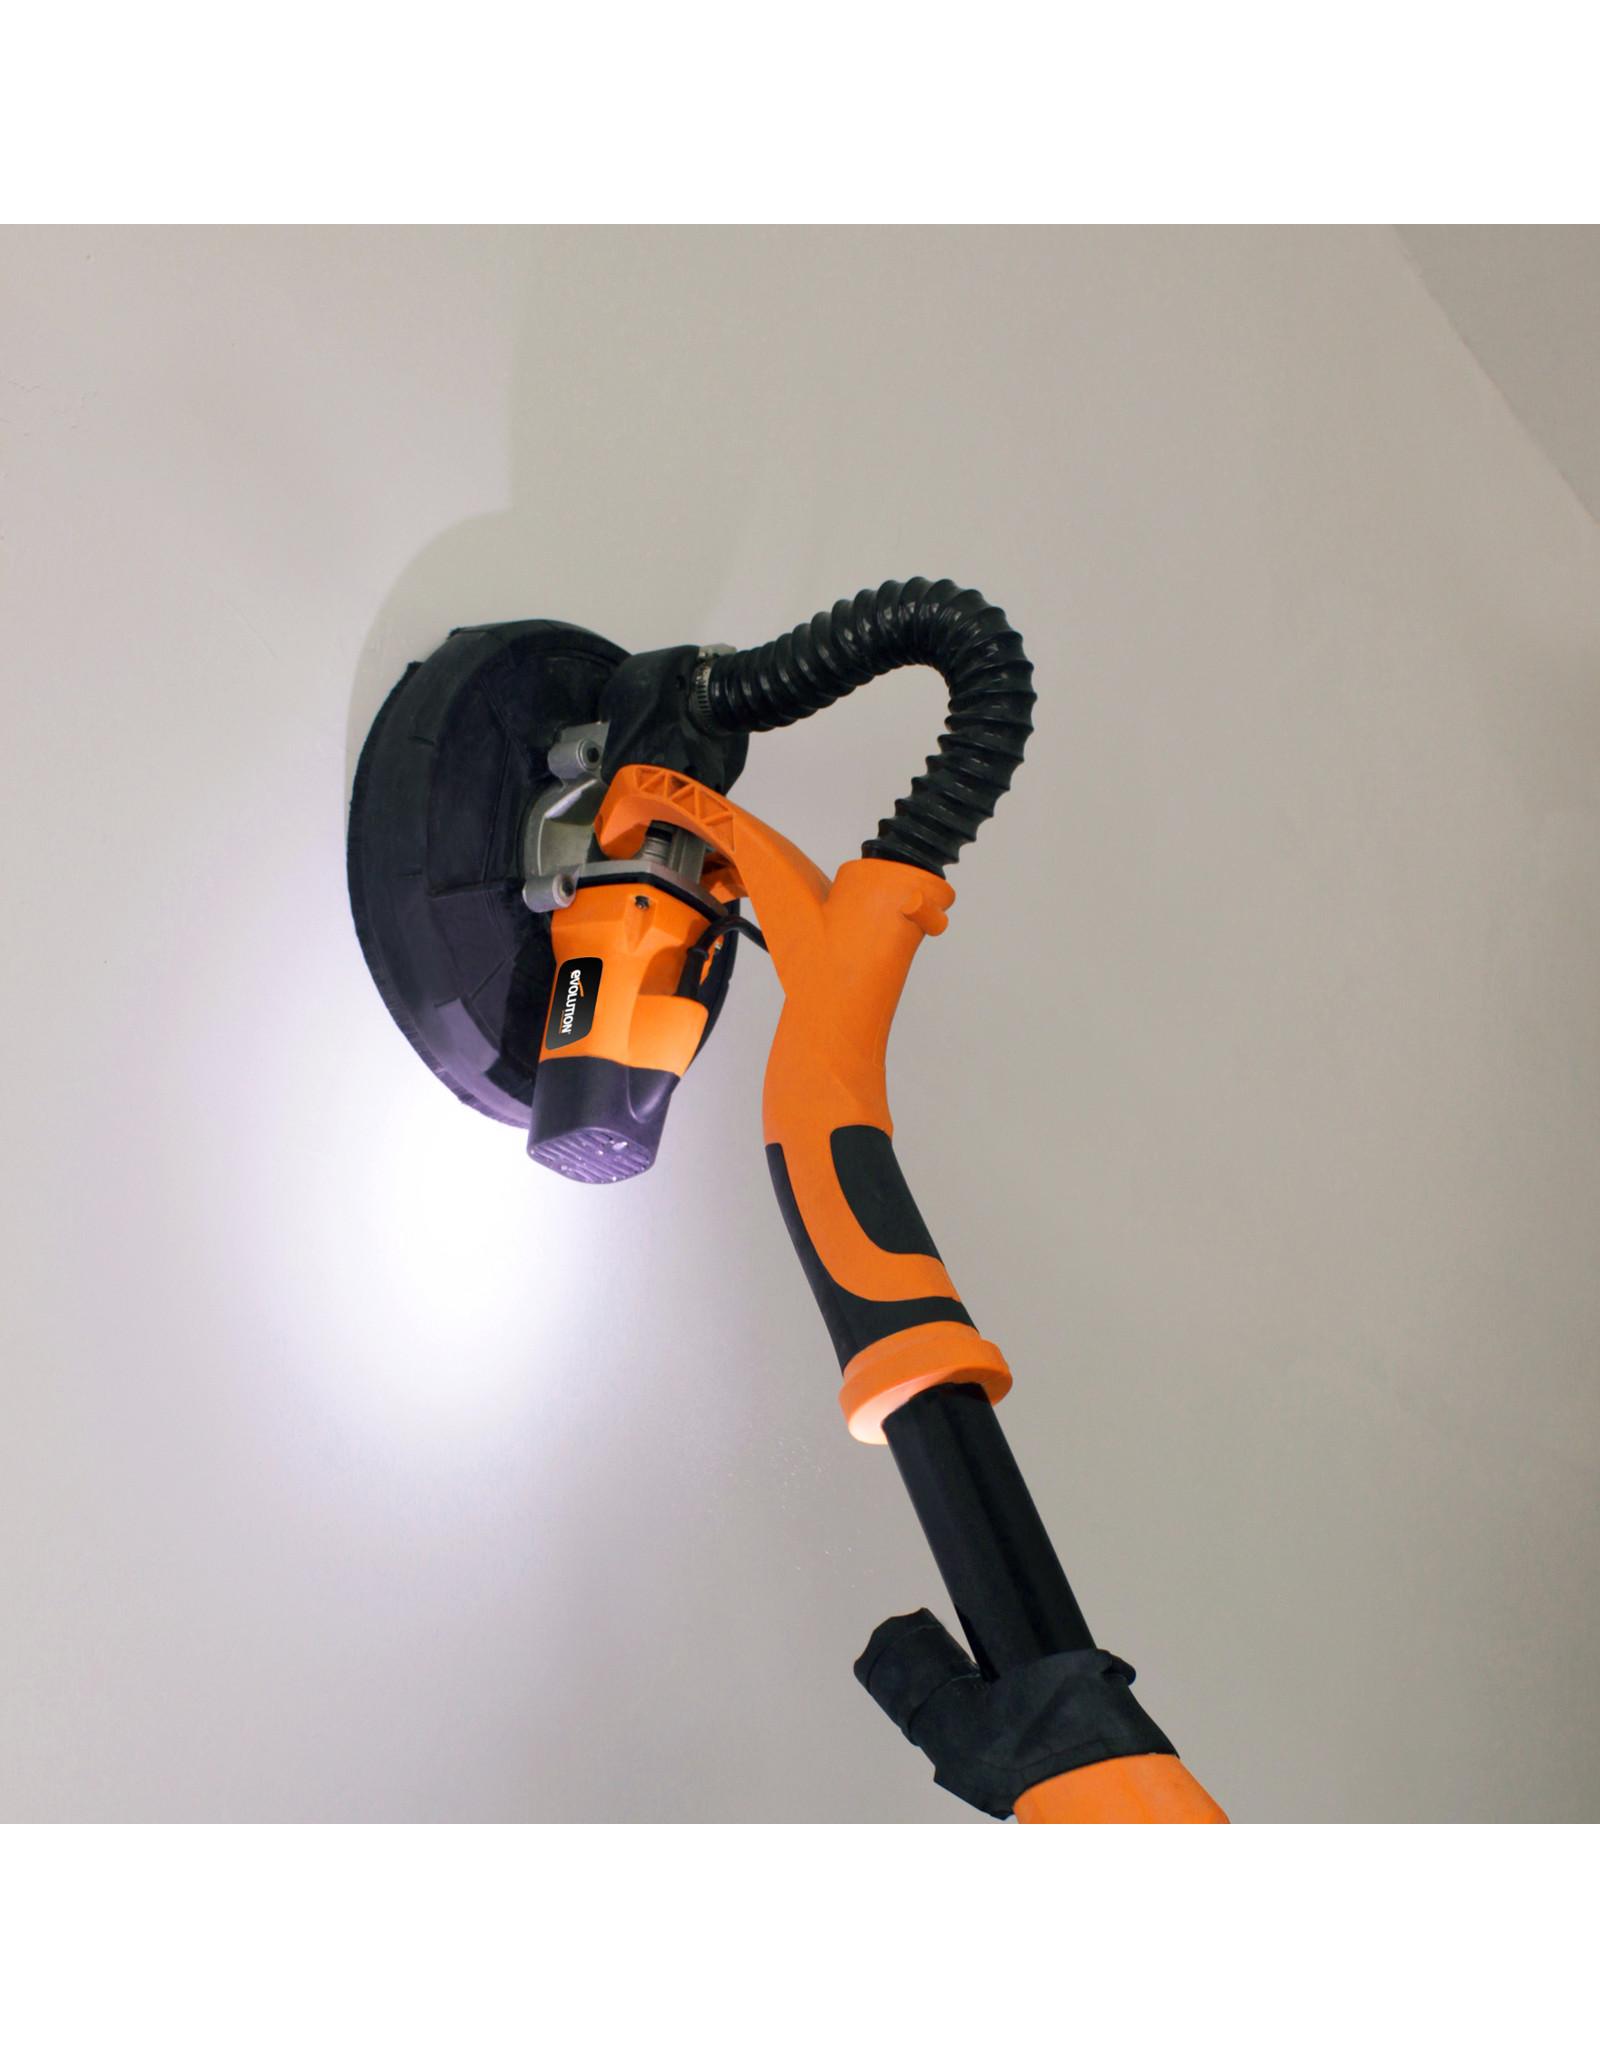 Evolution Power Tools Build Line PONCEUSE TELESCOPIQUE PLATRE EB225 DWSHH